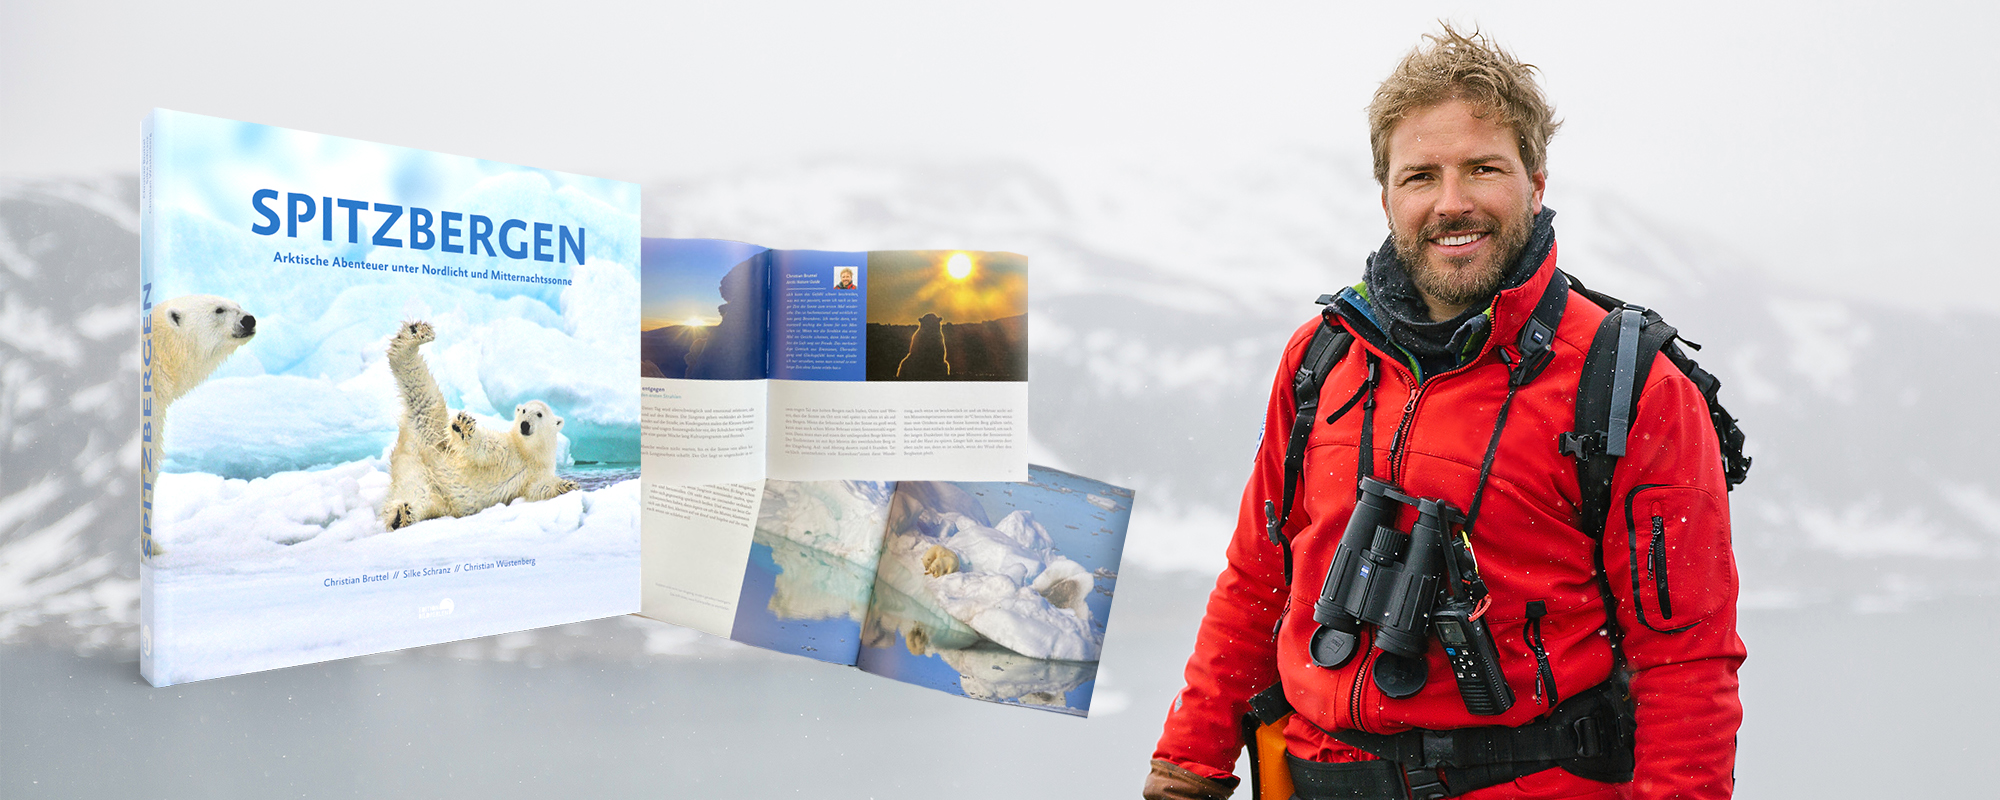 Spitzbergen Buch